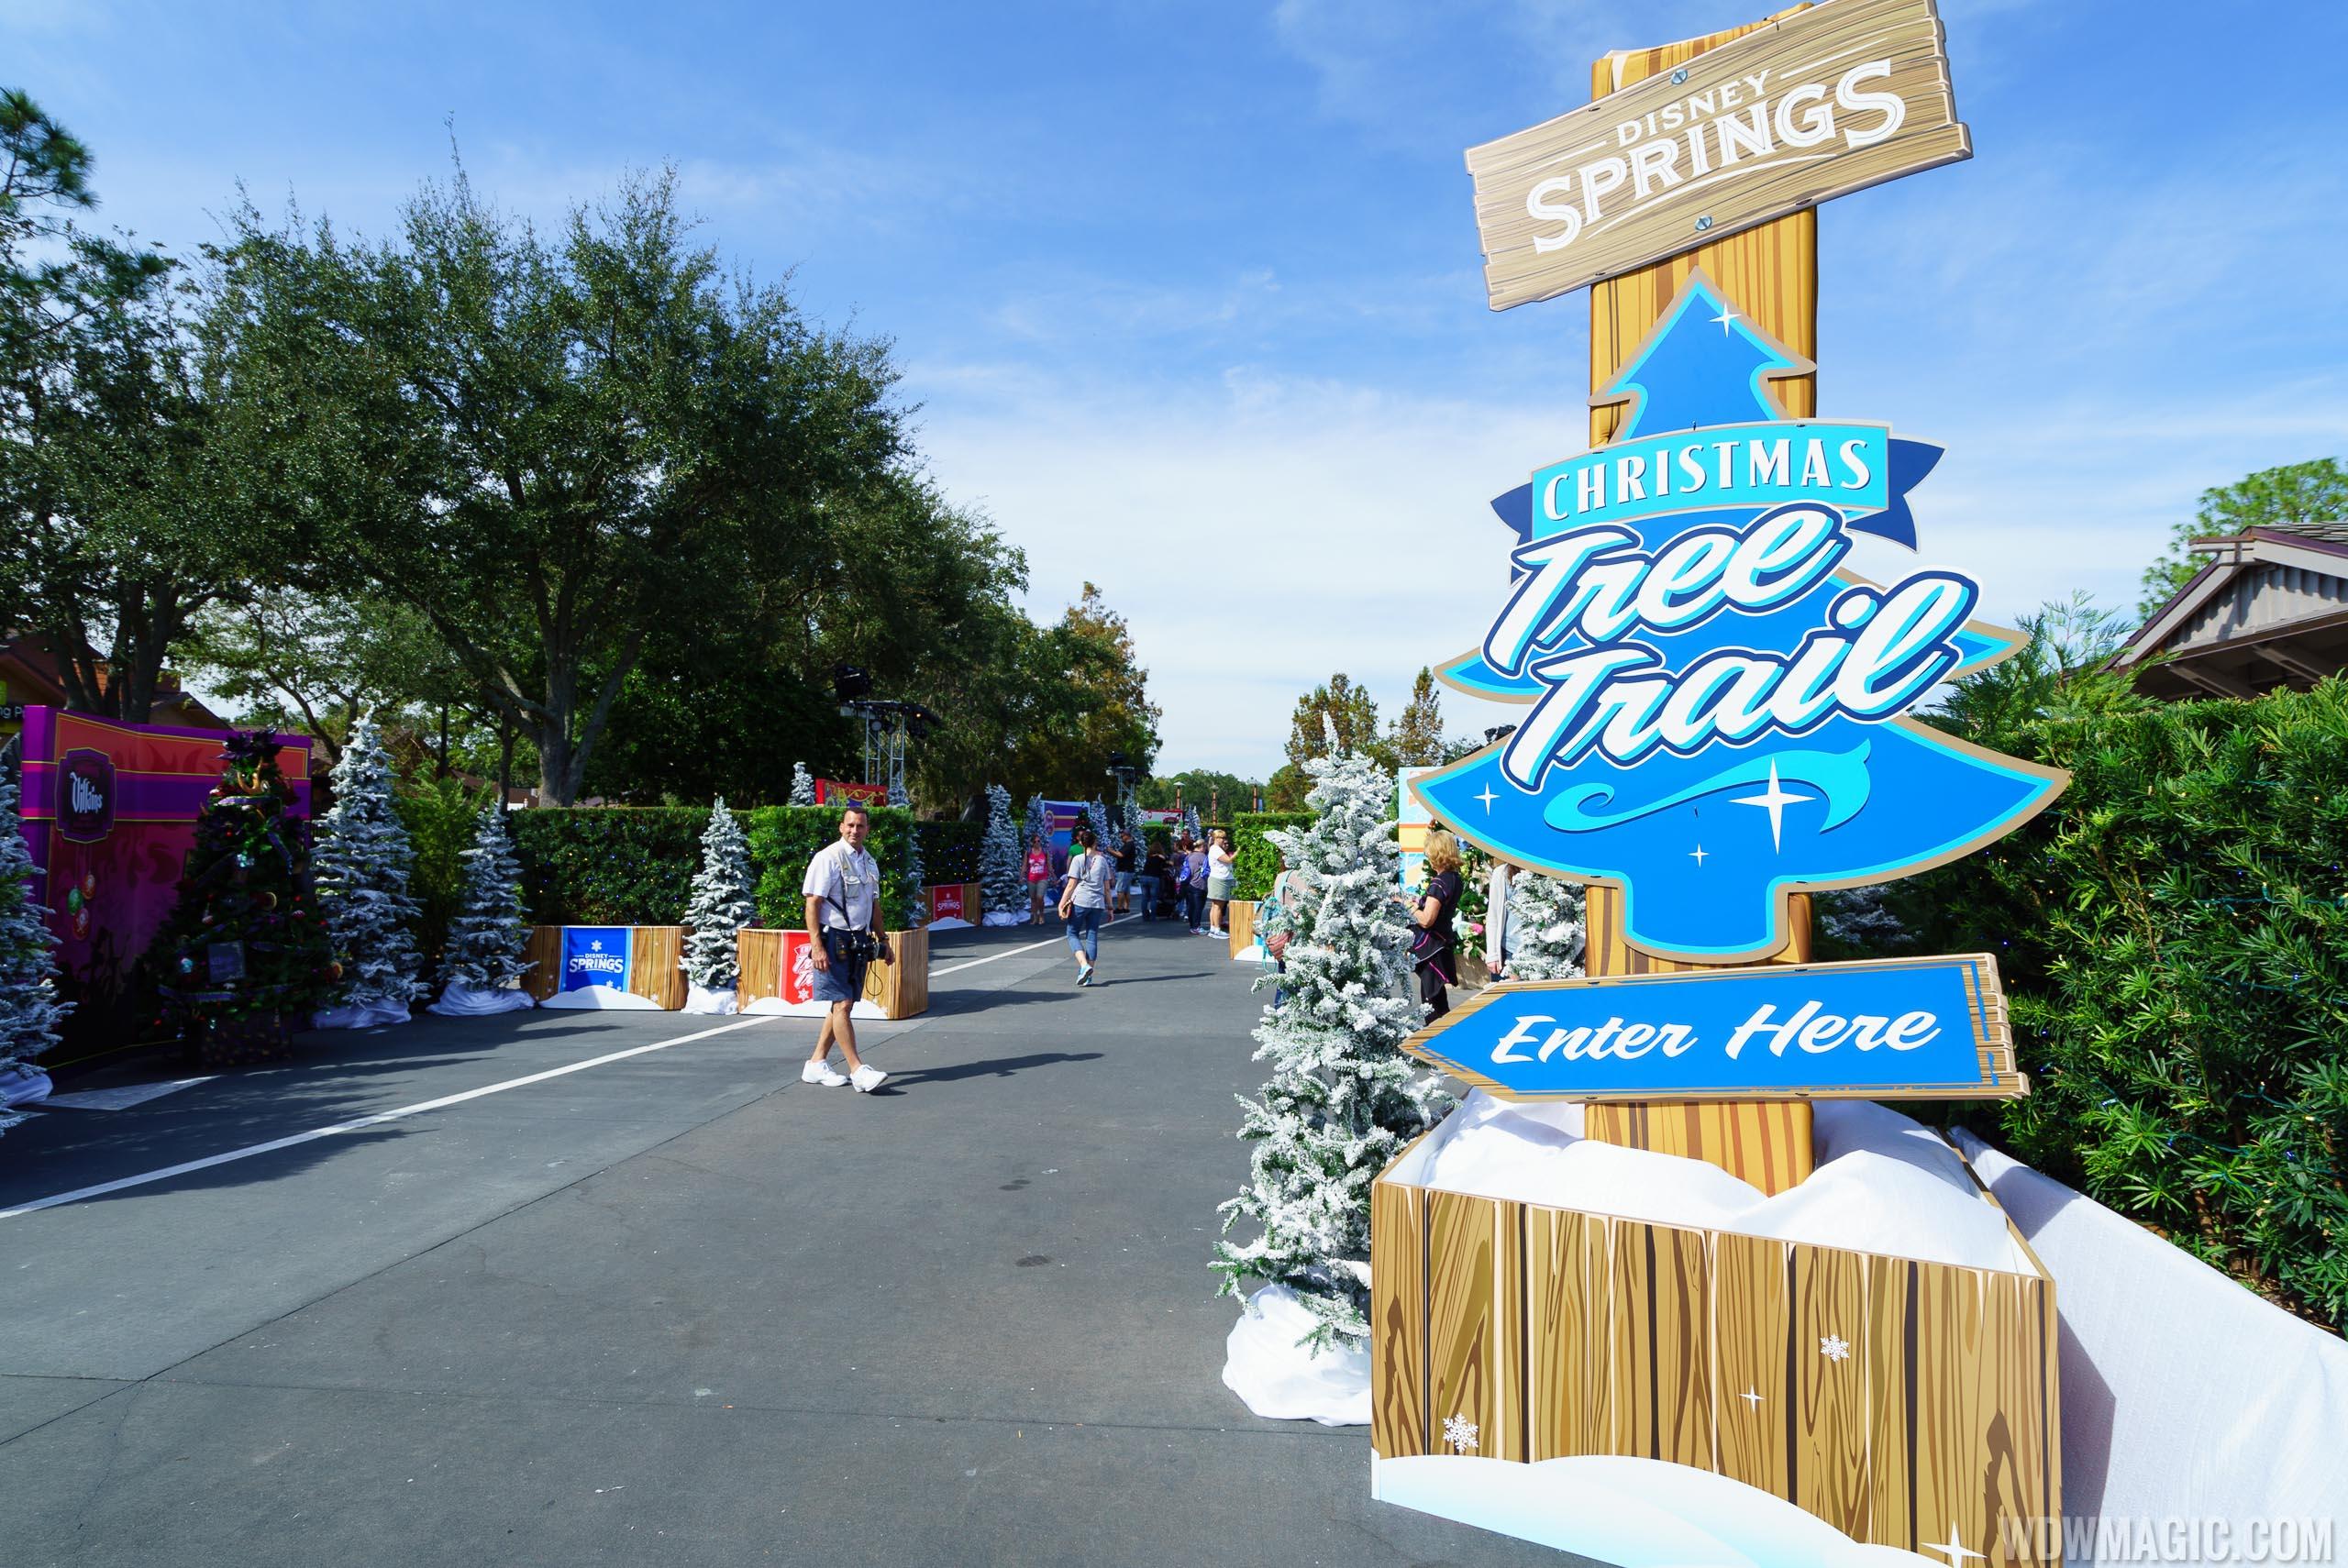 PHOTOS - Disney Springs Christmas Tree Trail now open